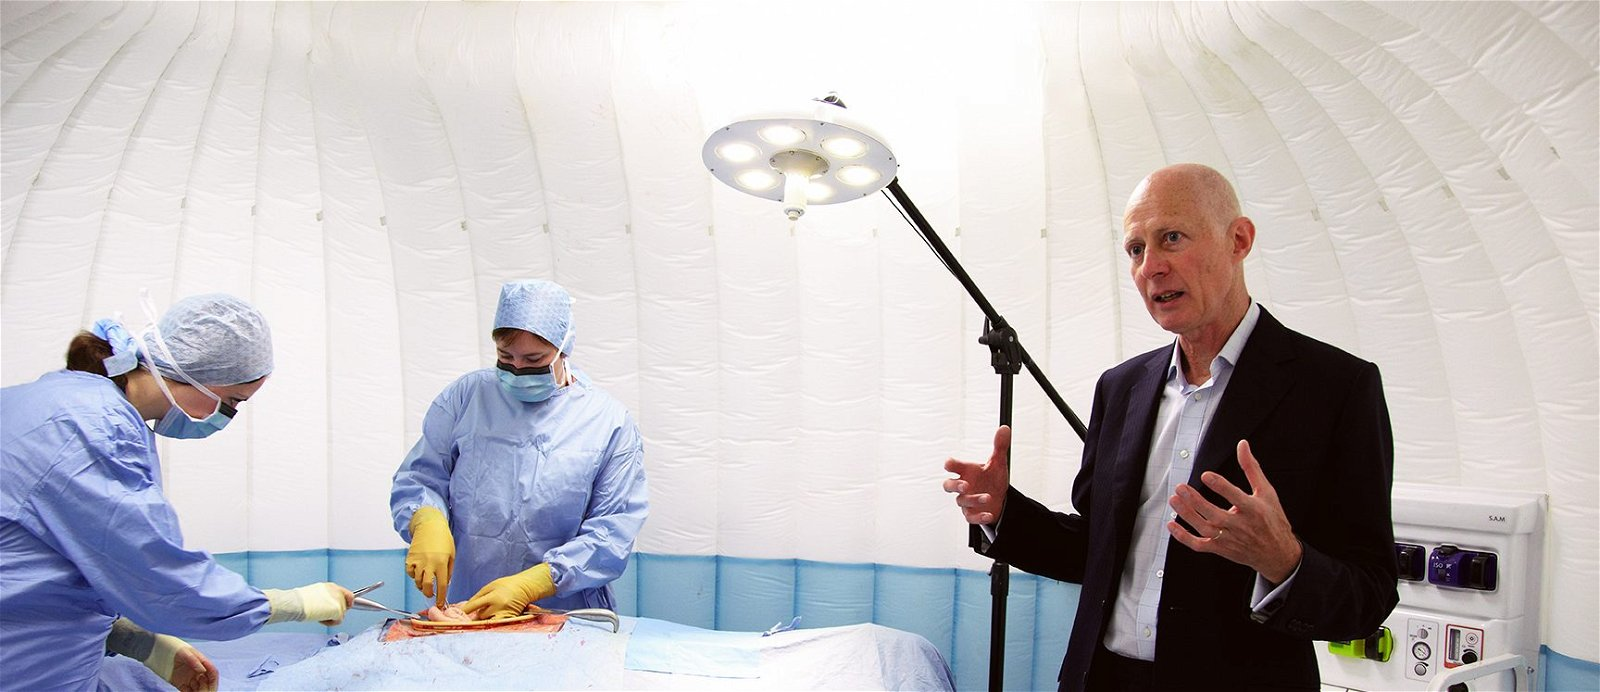 Roger Kneebone in surgery room